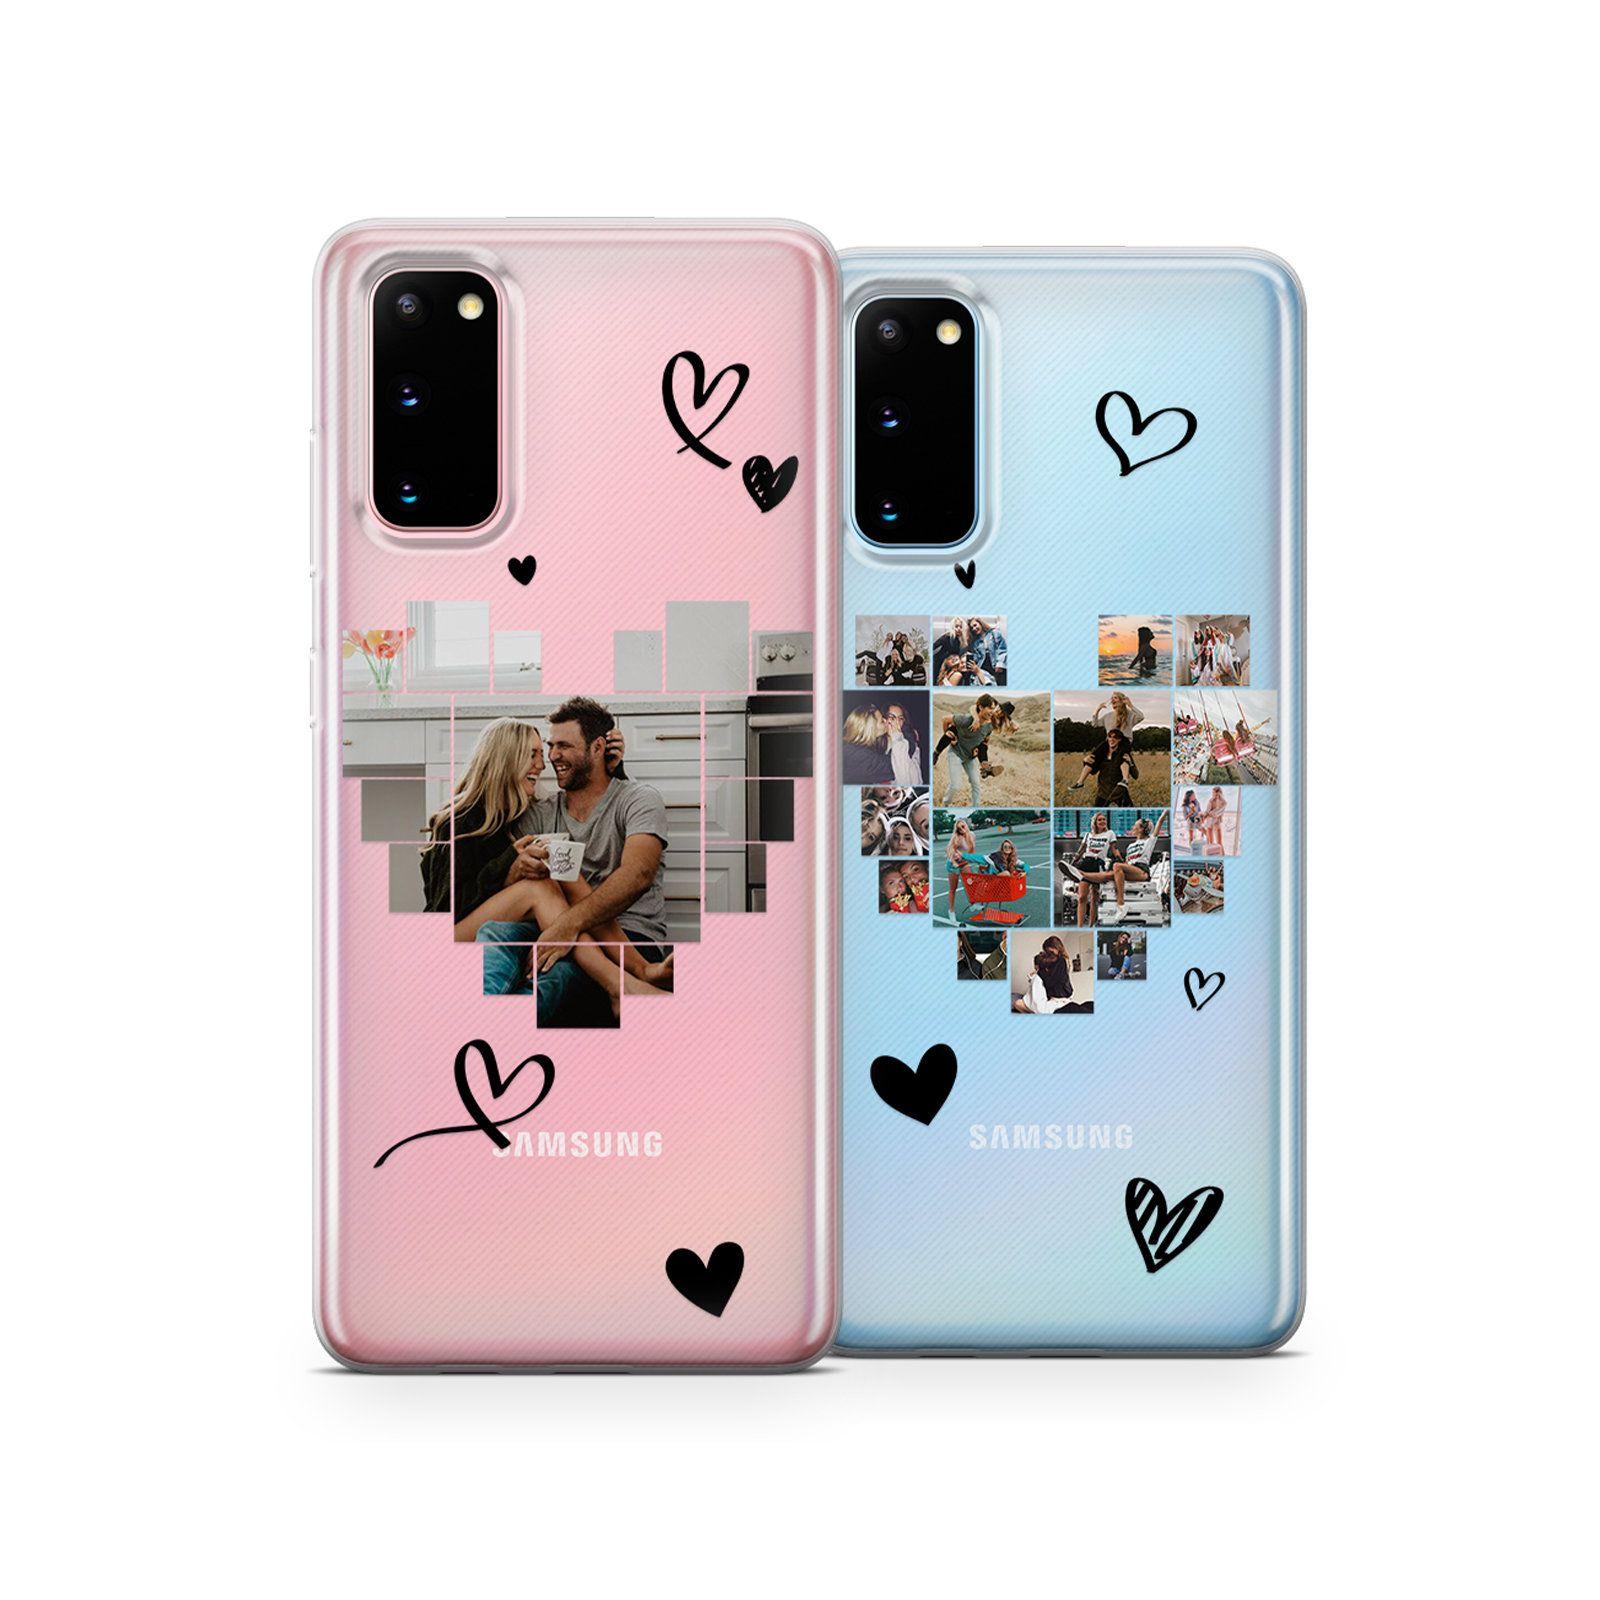 Custom Photo Collage Phone Case Samsung A51 A50 Samsung A40 Etsy In 2021 Collage Phone Case Samsung Phone Cases Samsung Cases